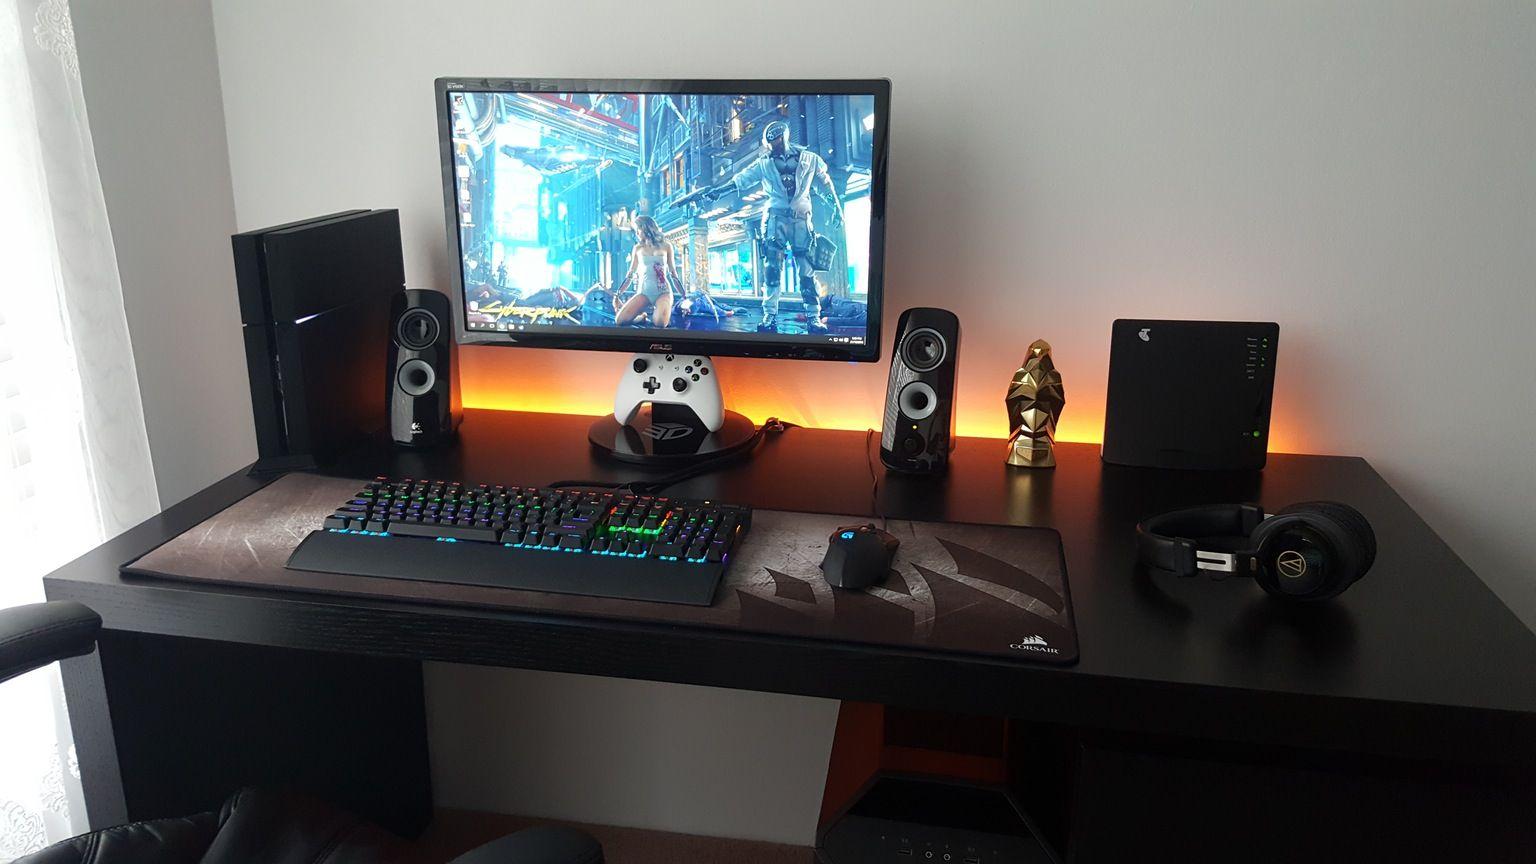 Gaming Desks   Gaming   Gaming setup, Pc console, Desk setup